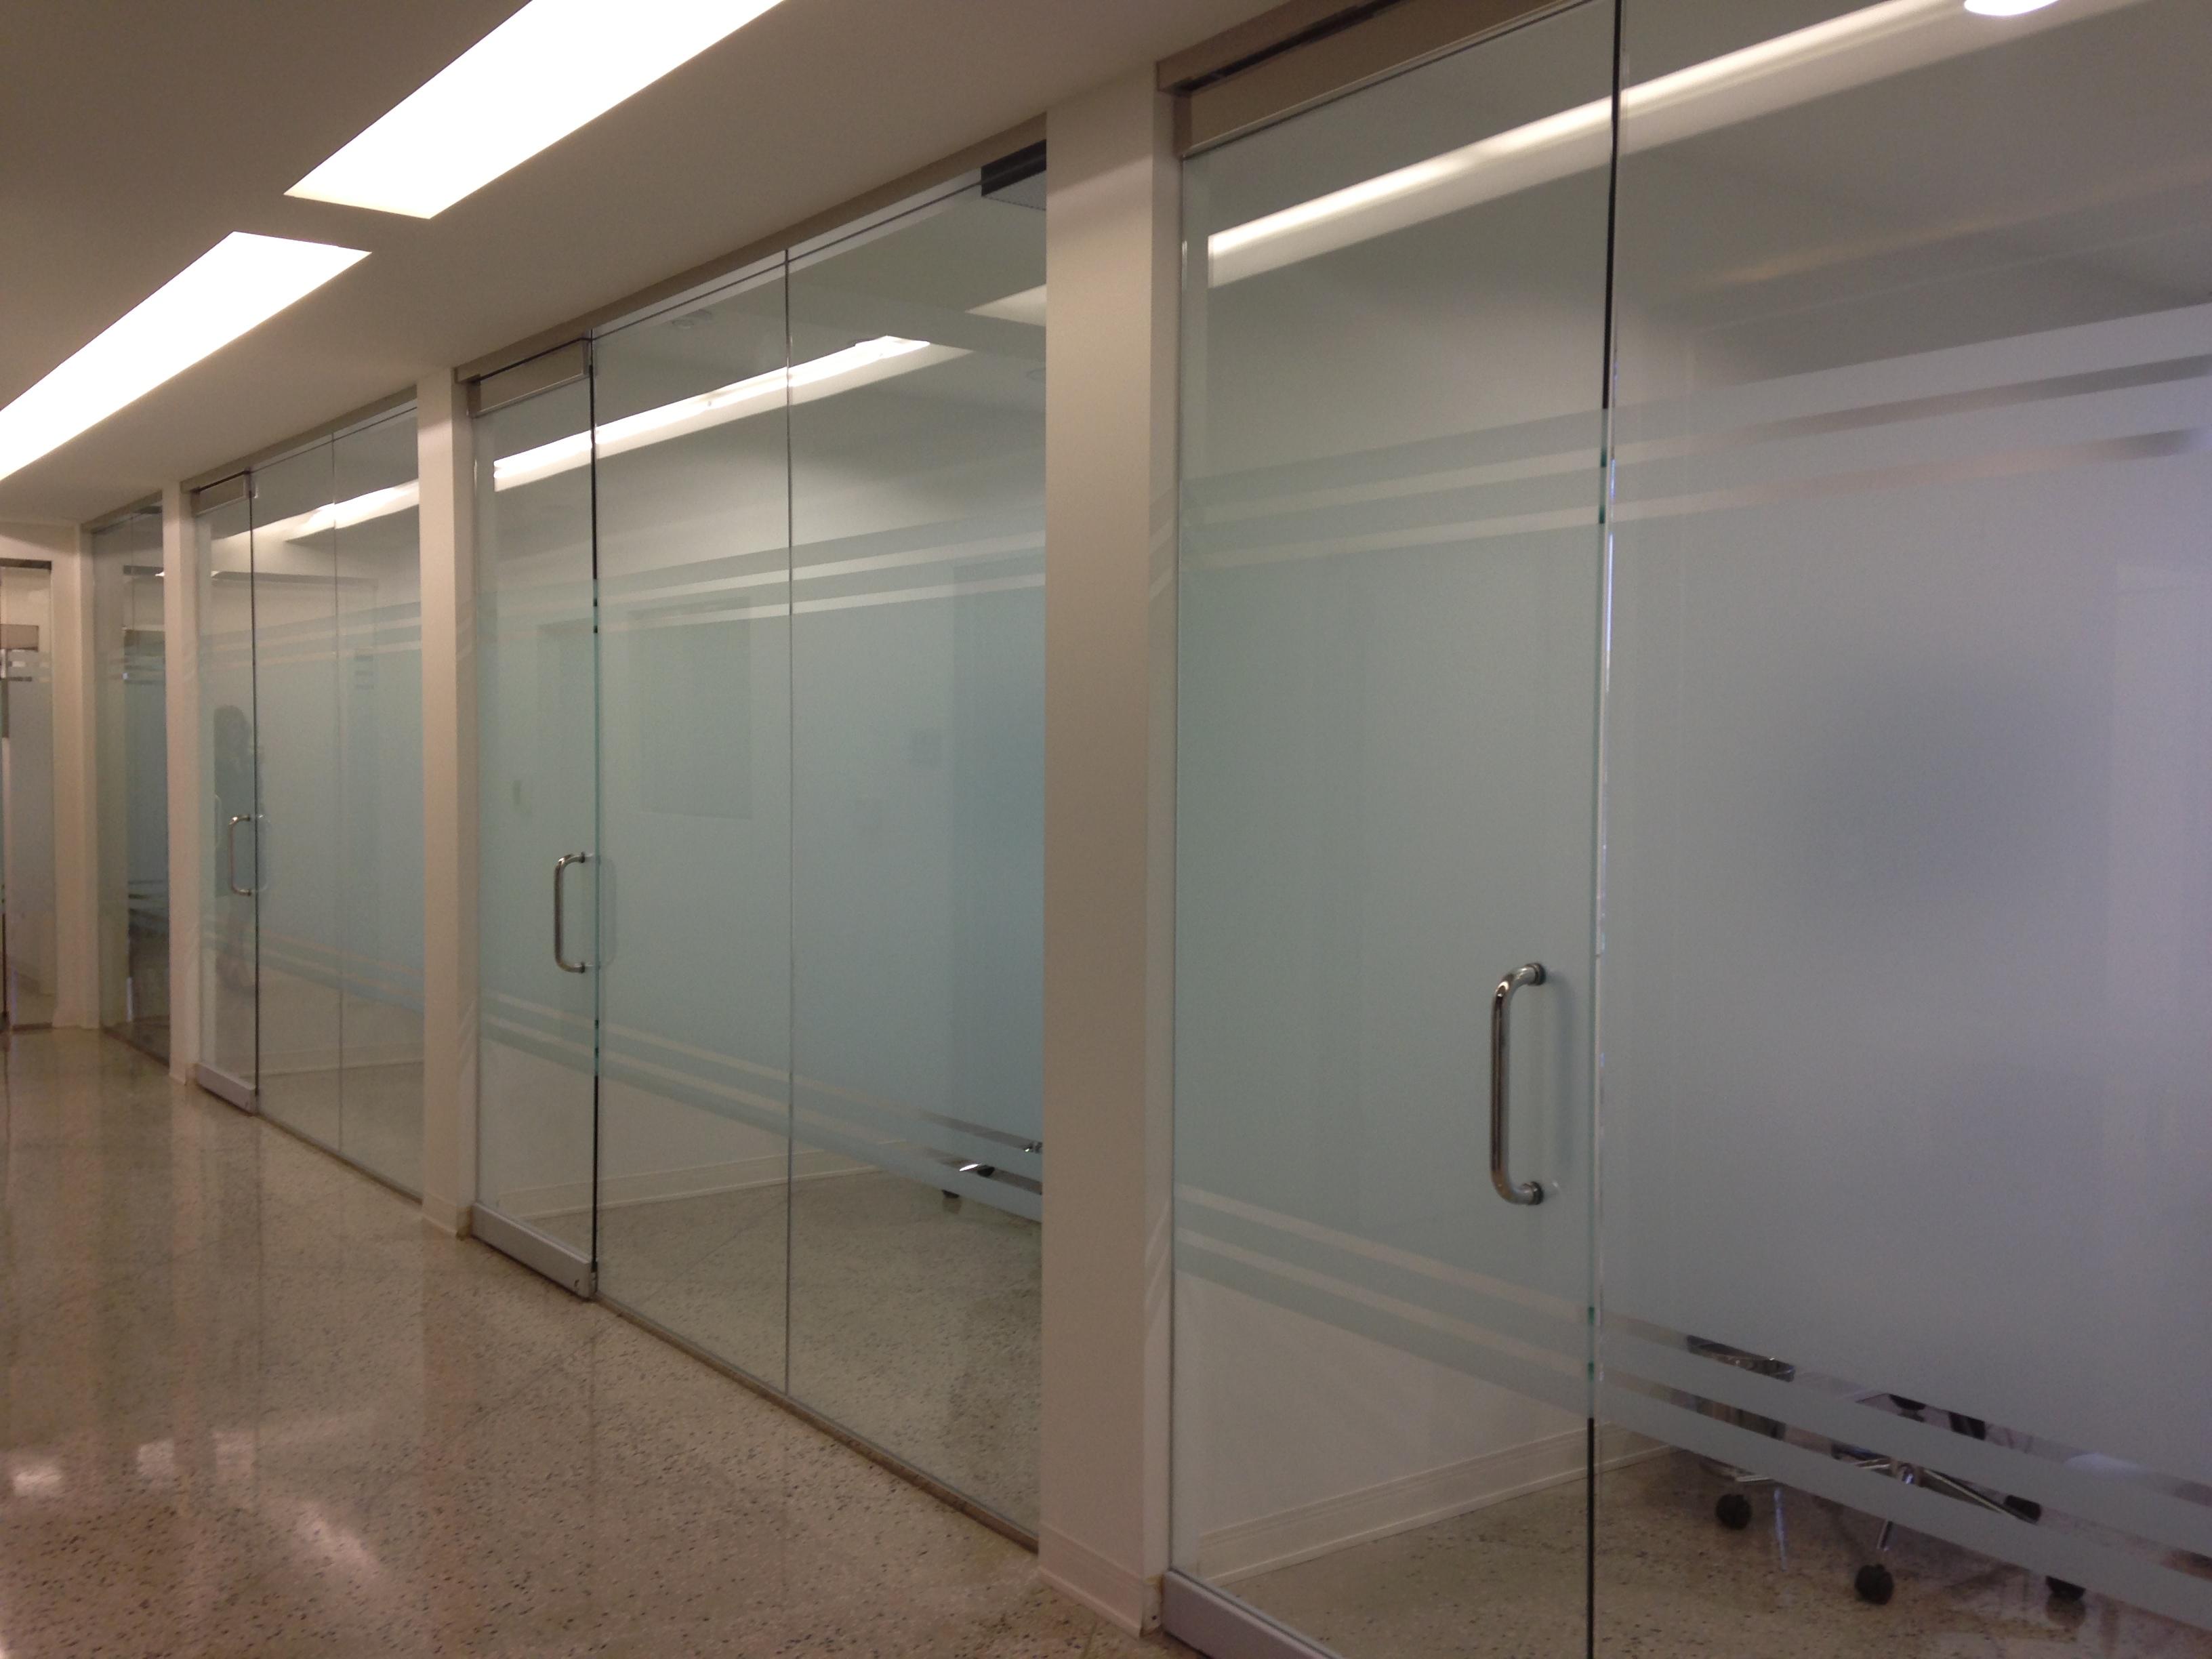 Decorative window film install in dental office Dallas, Tx